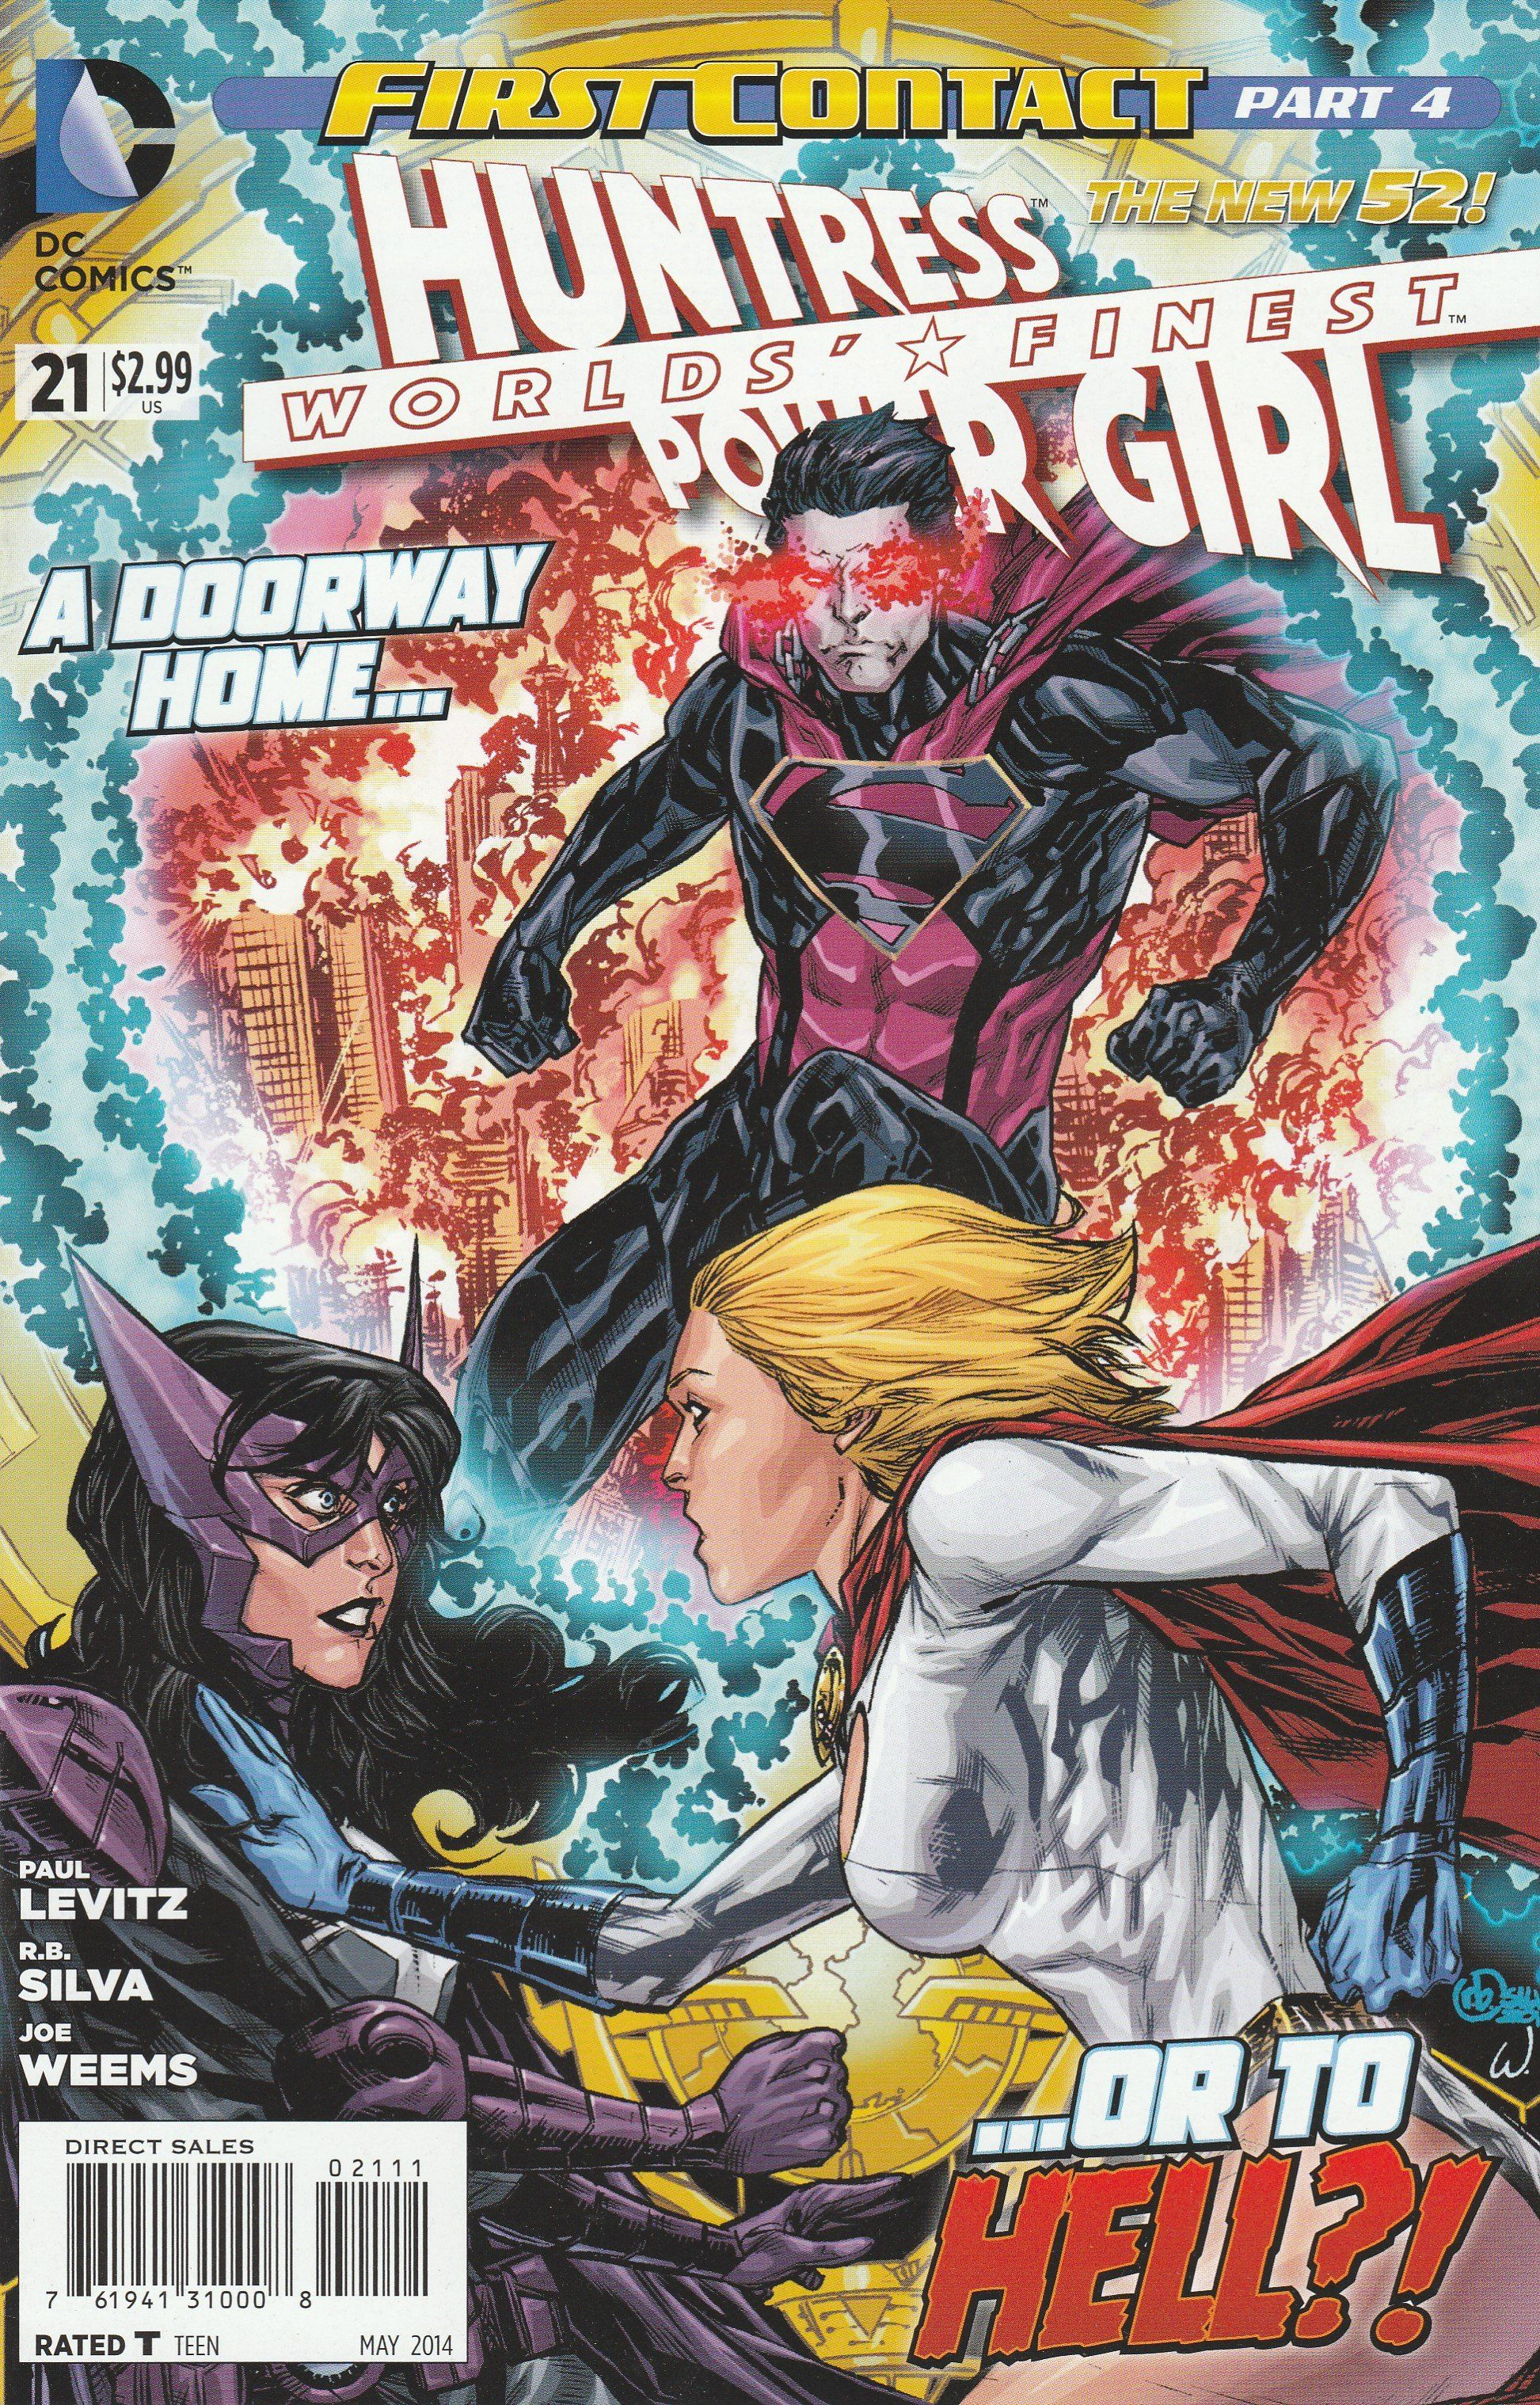 Worlds' Finest 21 DC Comics The New 52! Vol 3 Comics